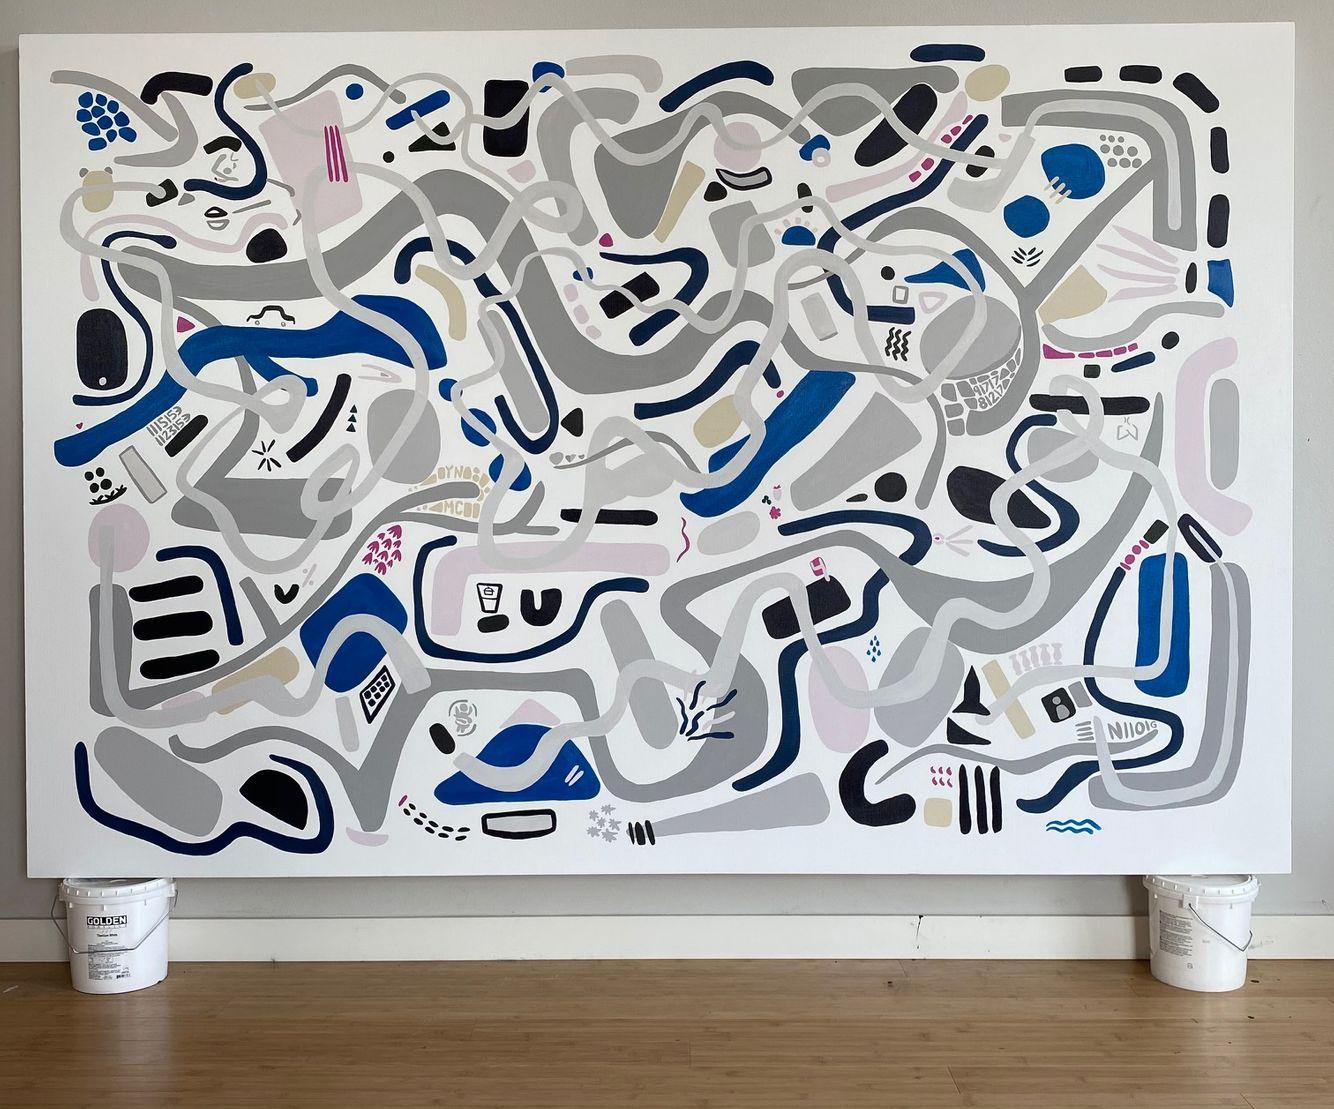 """Untitled"", Commission"